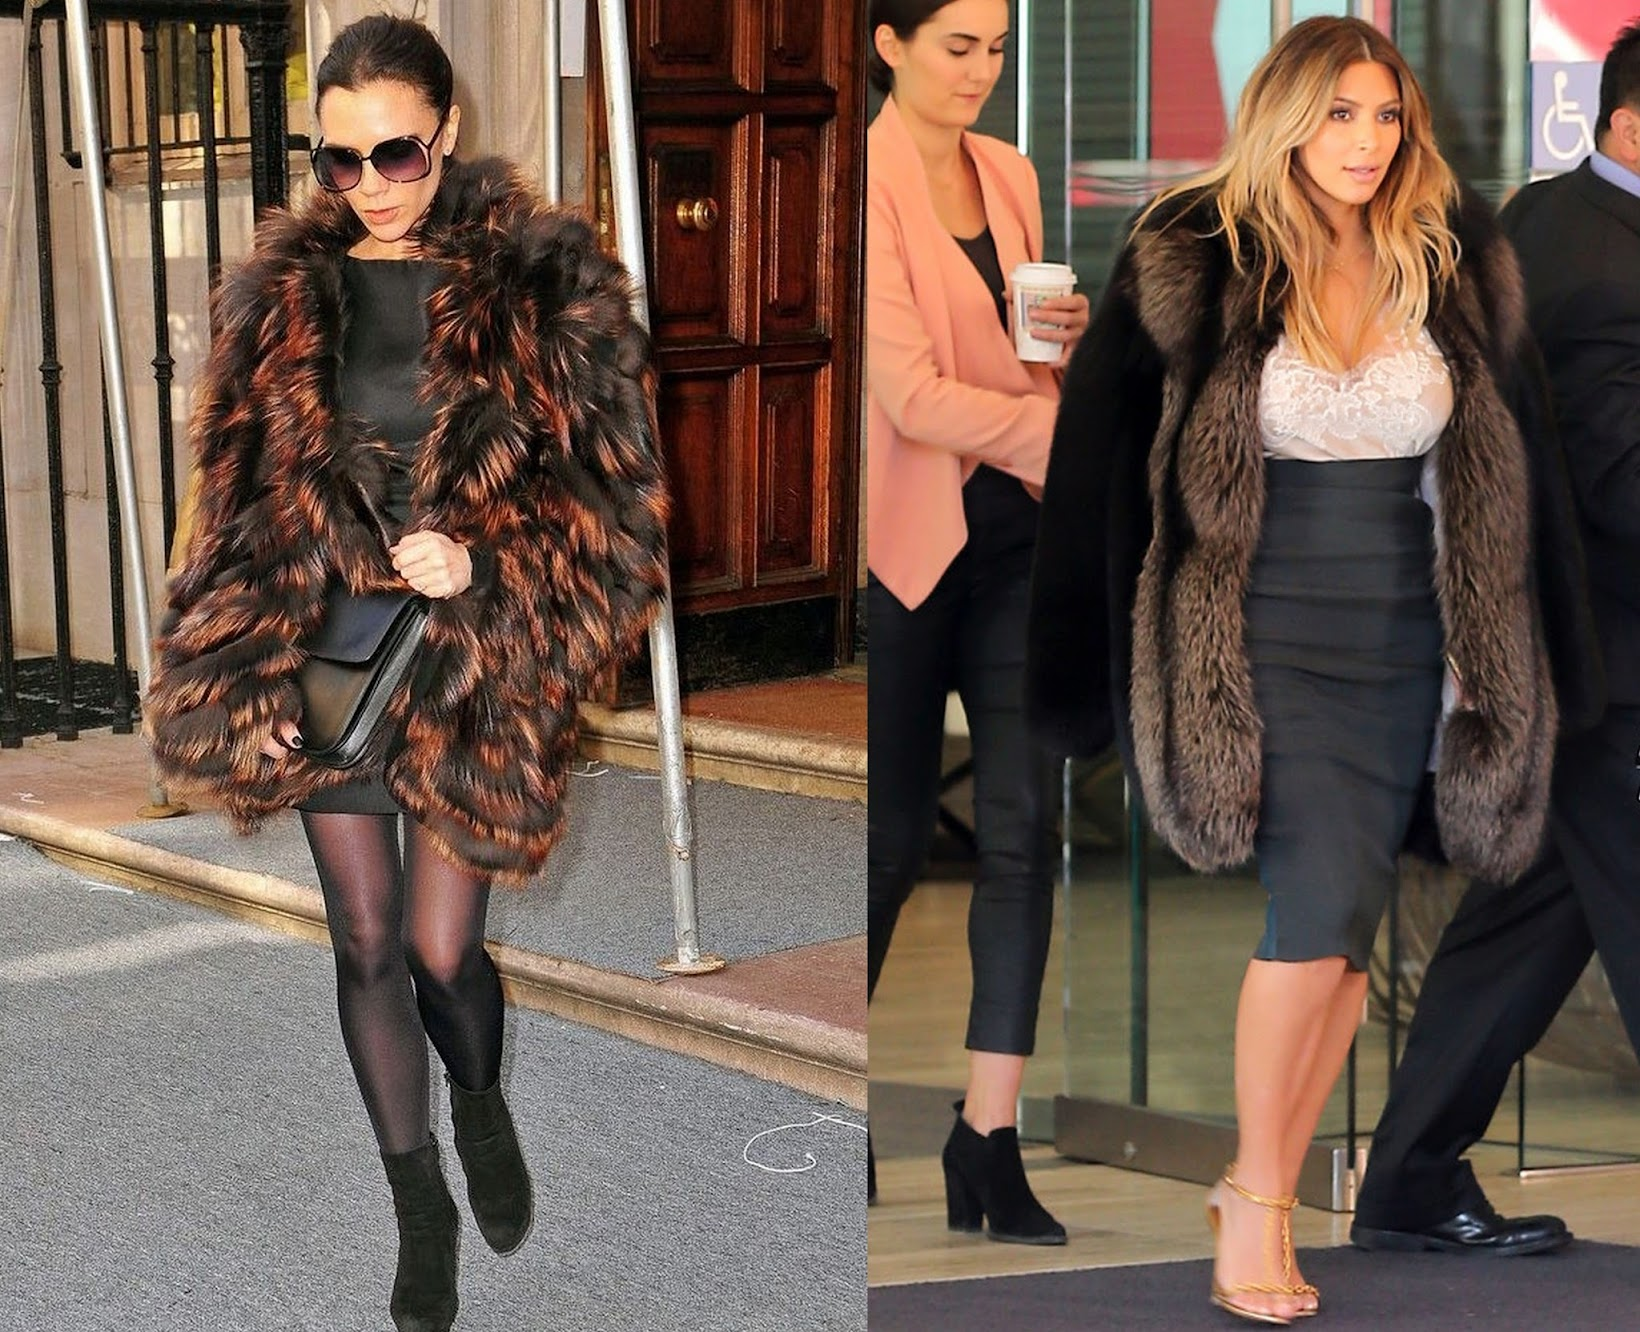 Faux Fur for autumn/winter, affordable faux fur coats online, Kim Kardashian in faux fur, Victoria Beckham, wholesalebuying.com, Indian fashion blogger